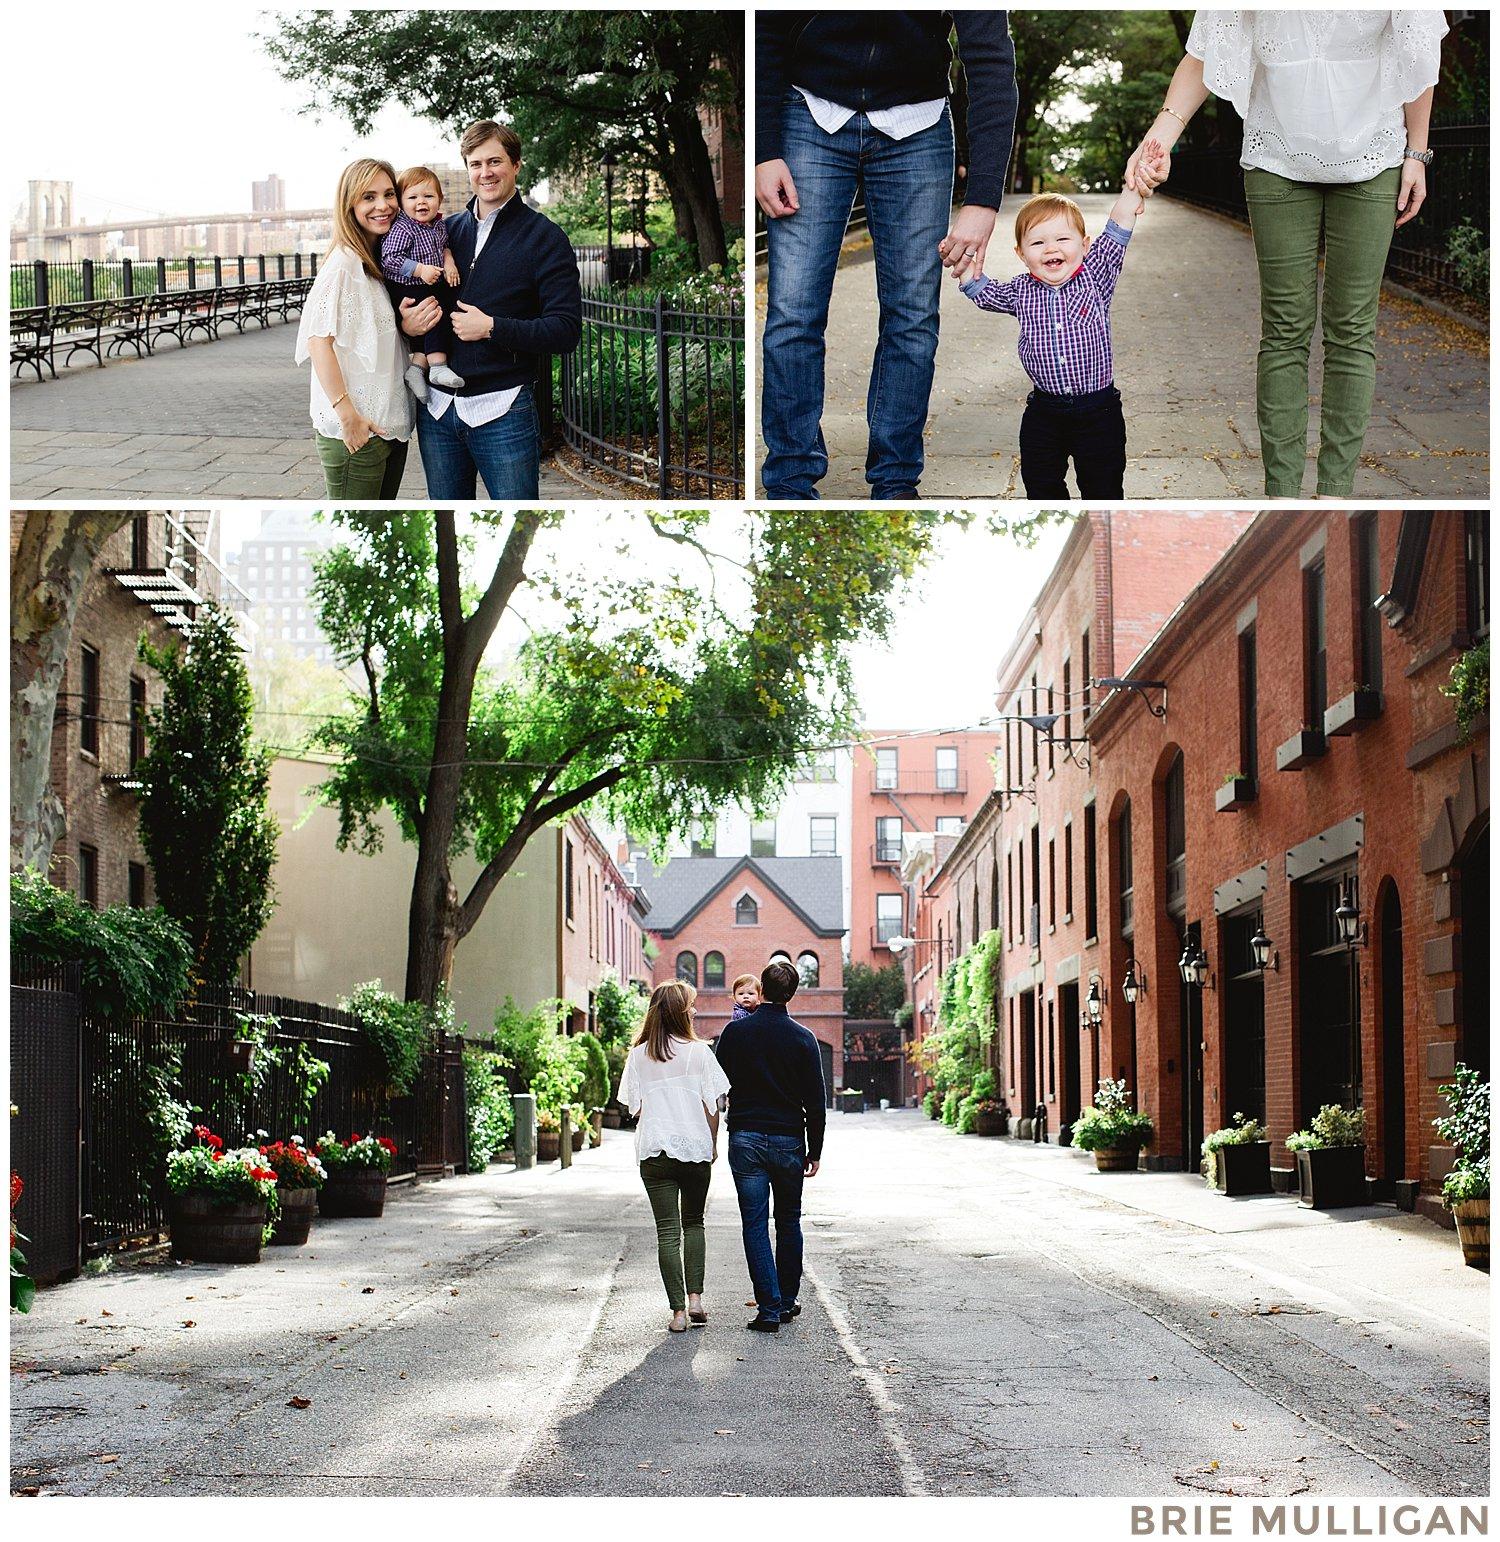 Brie-Mulligan-Family-and-Newborn-Photographer-NYC-and-Northern-NJ_0130.jpg